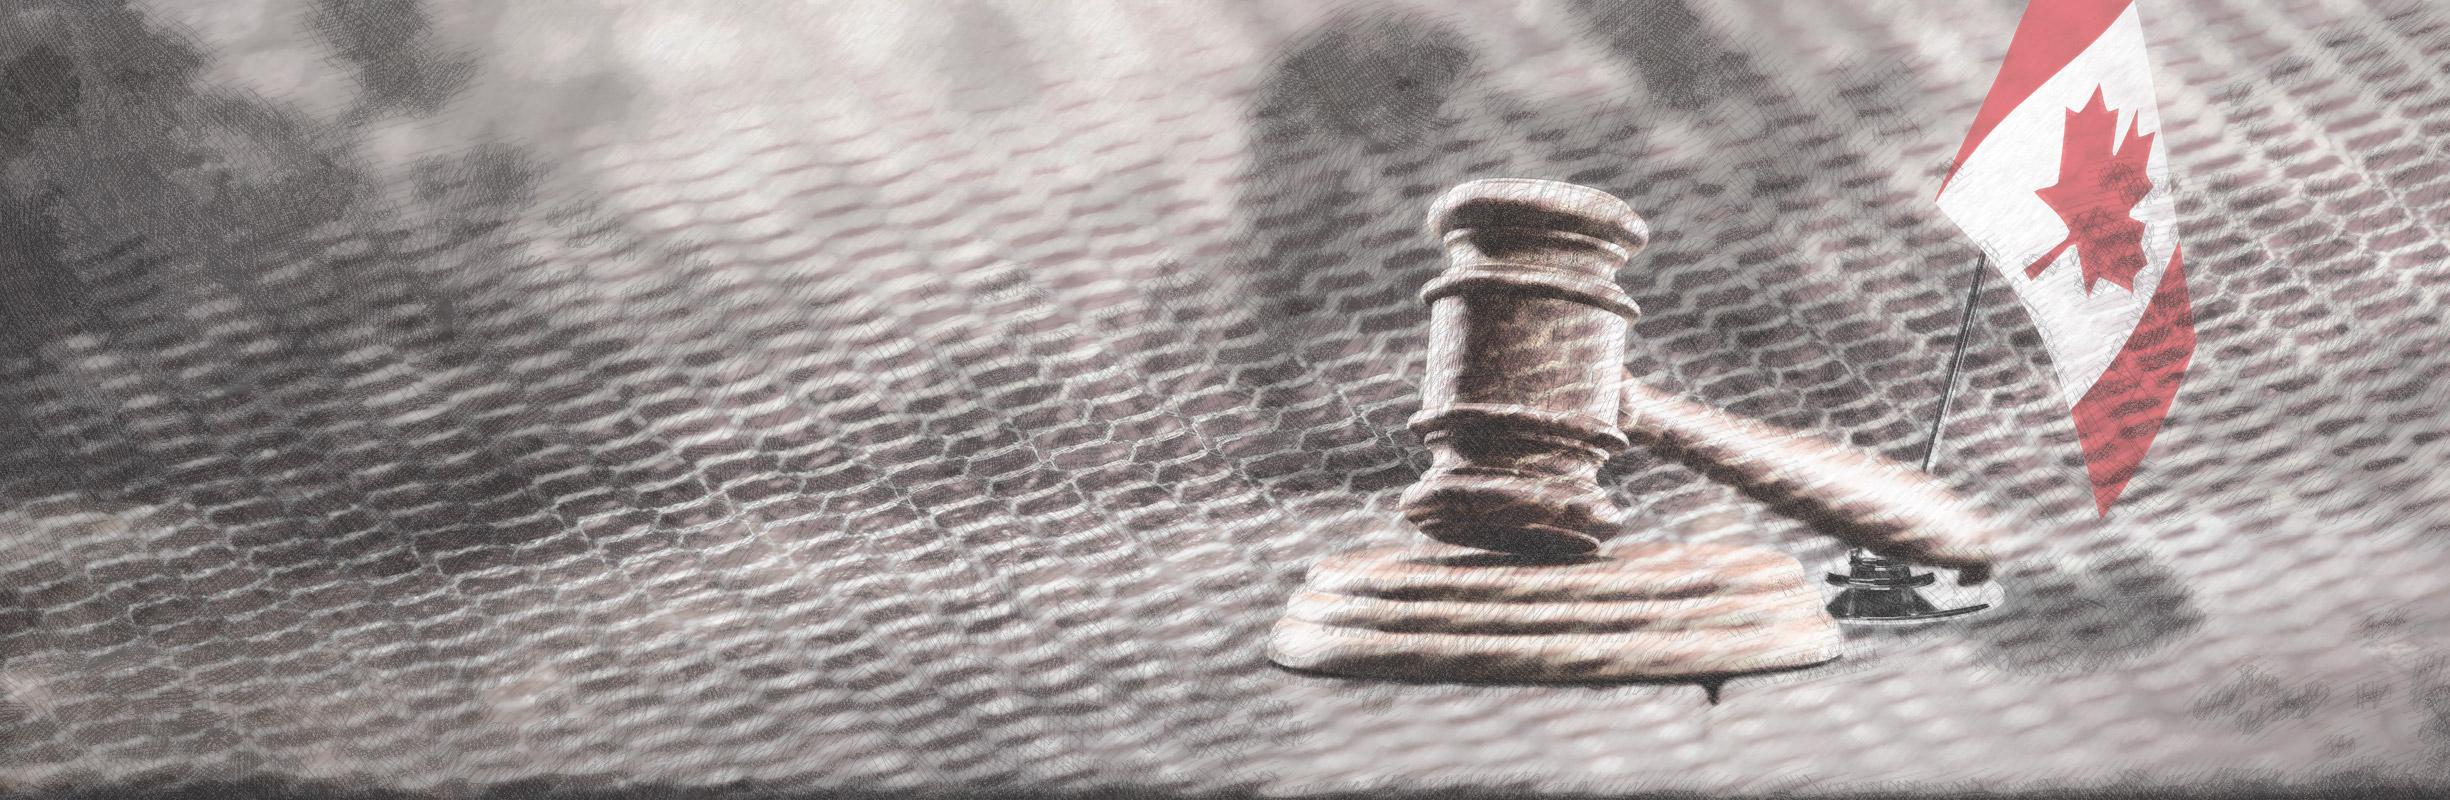 Hernia Mesh Lawsuit in Canada – Hernia Mesh Lawsuit In Canada